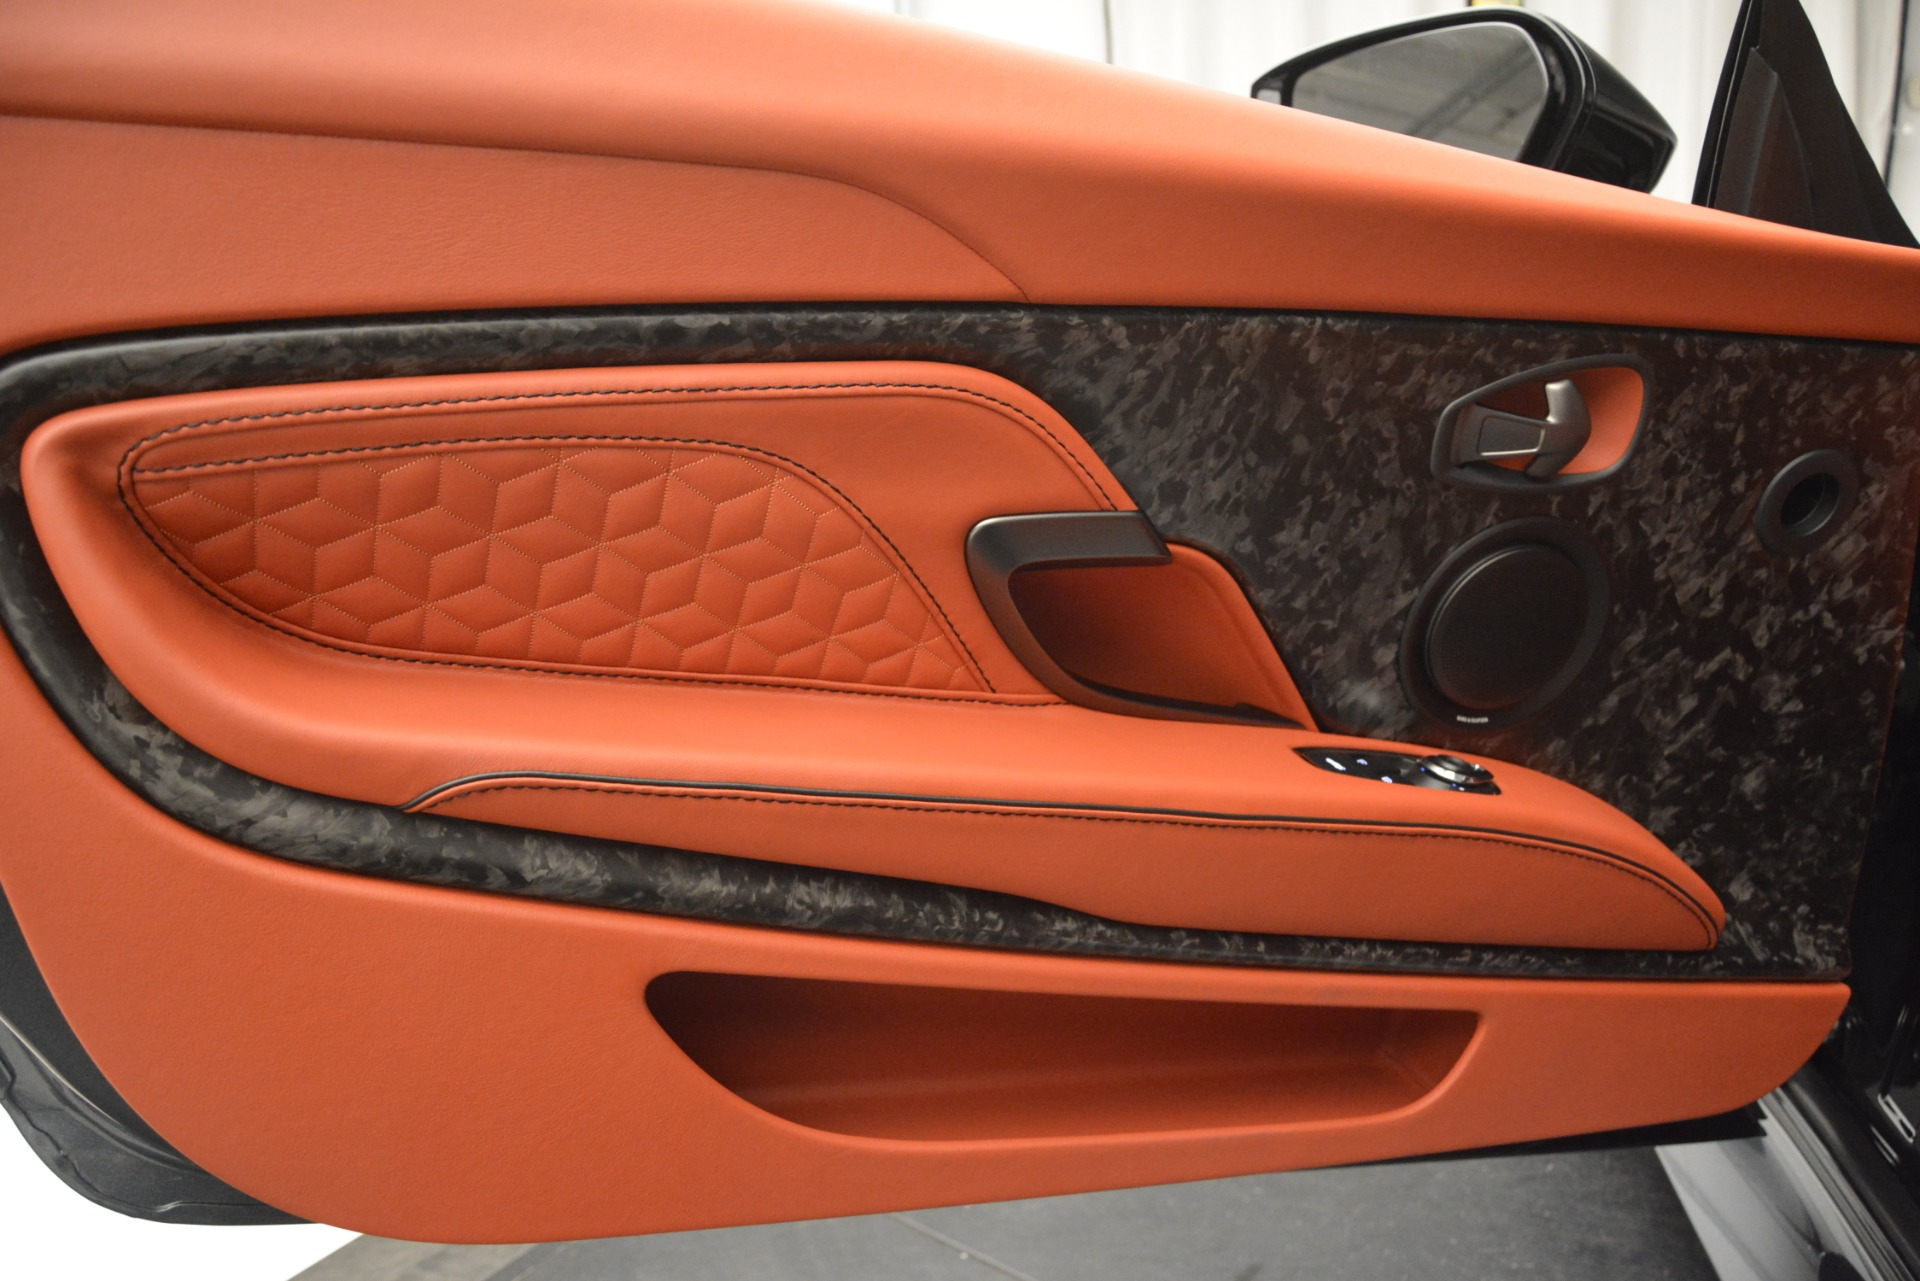 New 2019 Aston Martin DBS Superleggera For Sale In Greenwich, CT 2827_p20